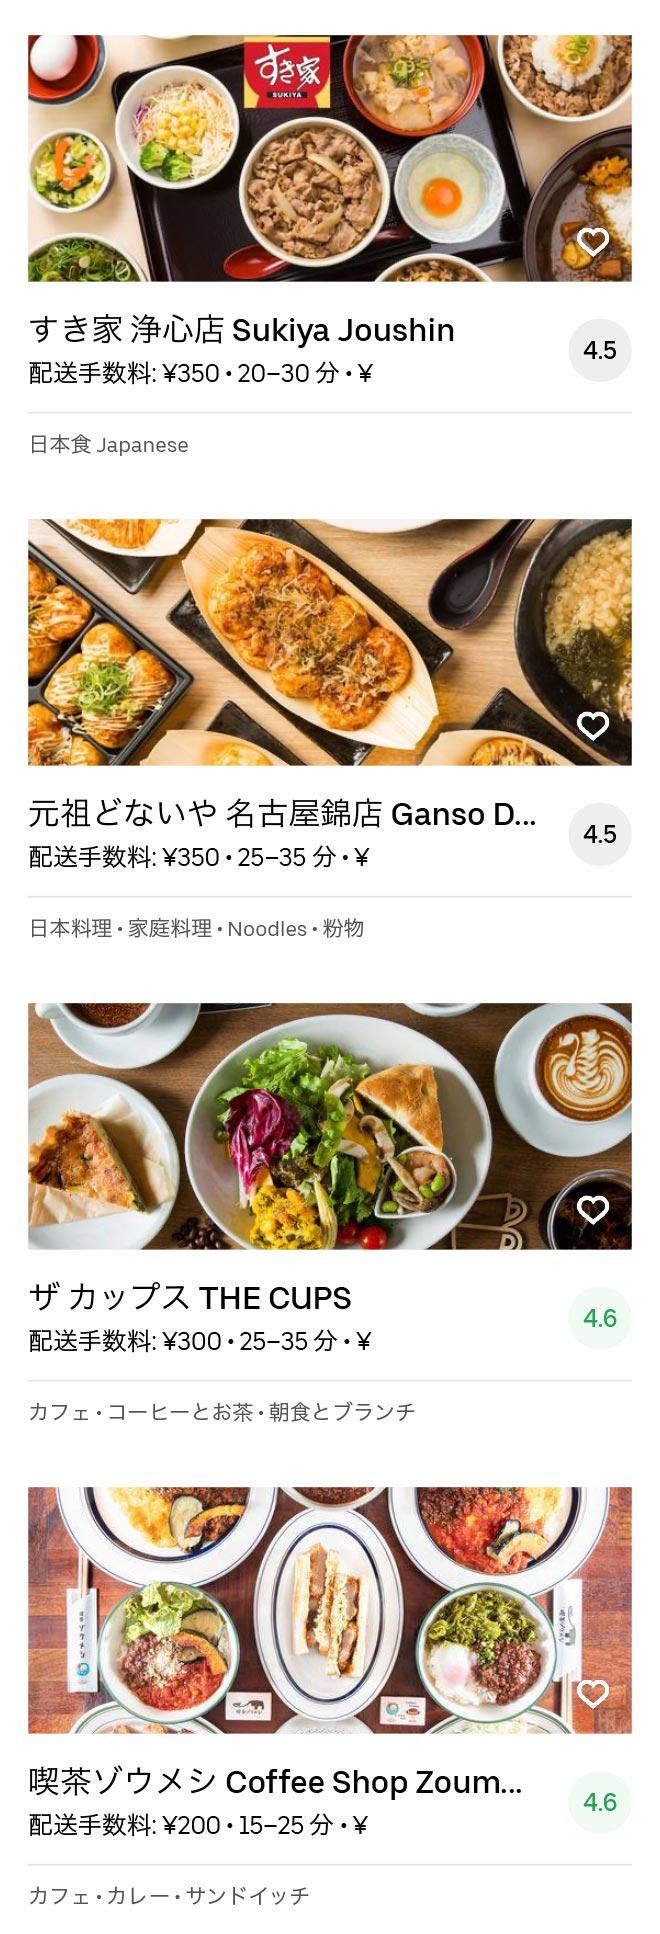 Nagoya nakamura menu 2005 06